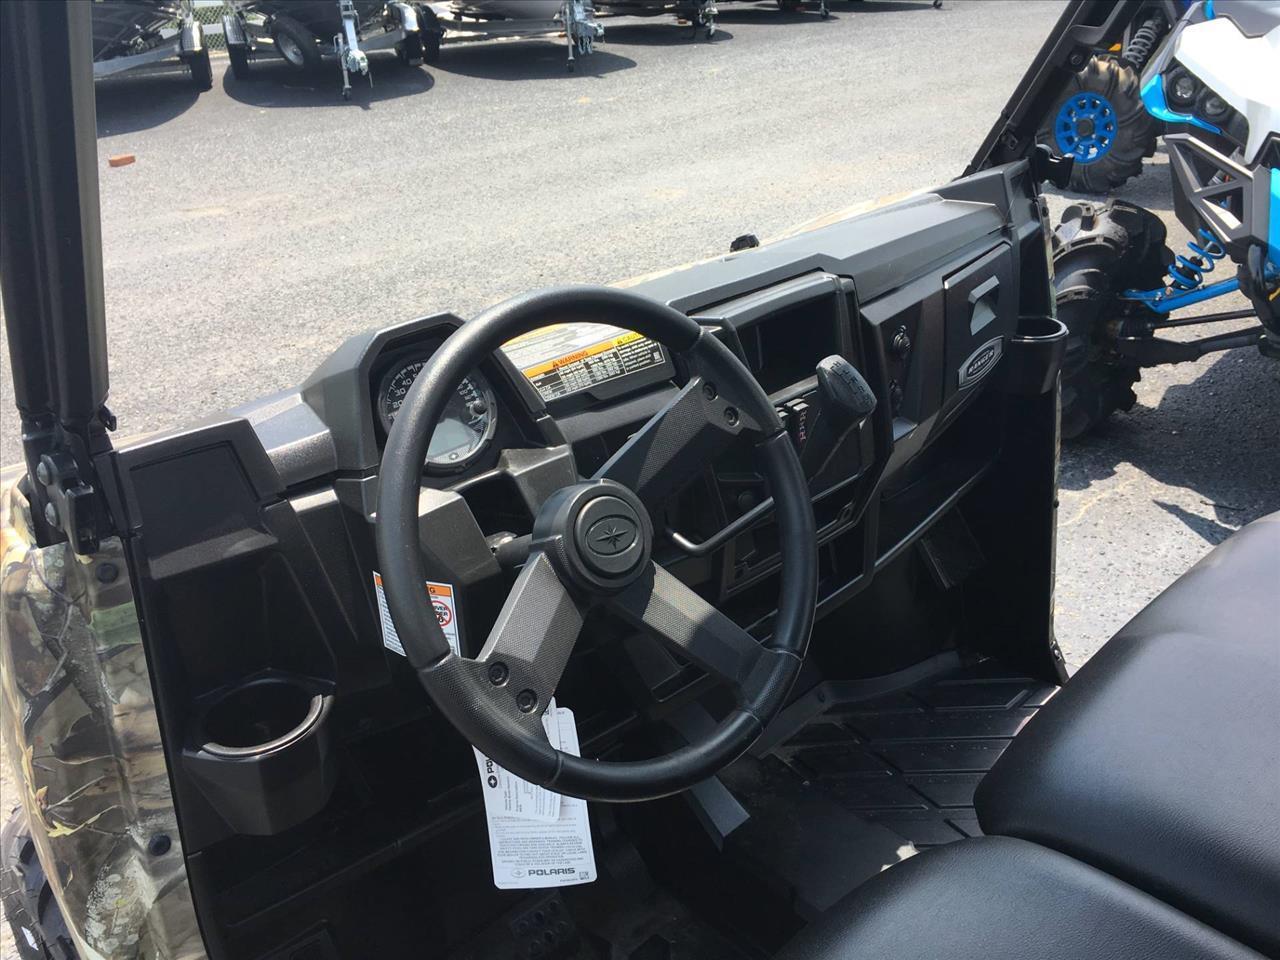 2017 Polaris Ranger XP 900 Camo for sale at Vehicle Network, LLC - Performance East, INC. in Goldsboro NC